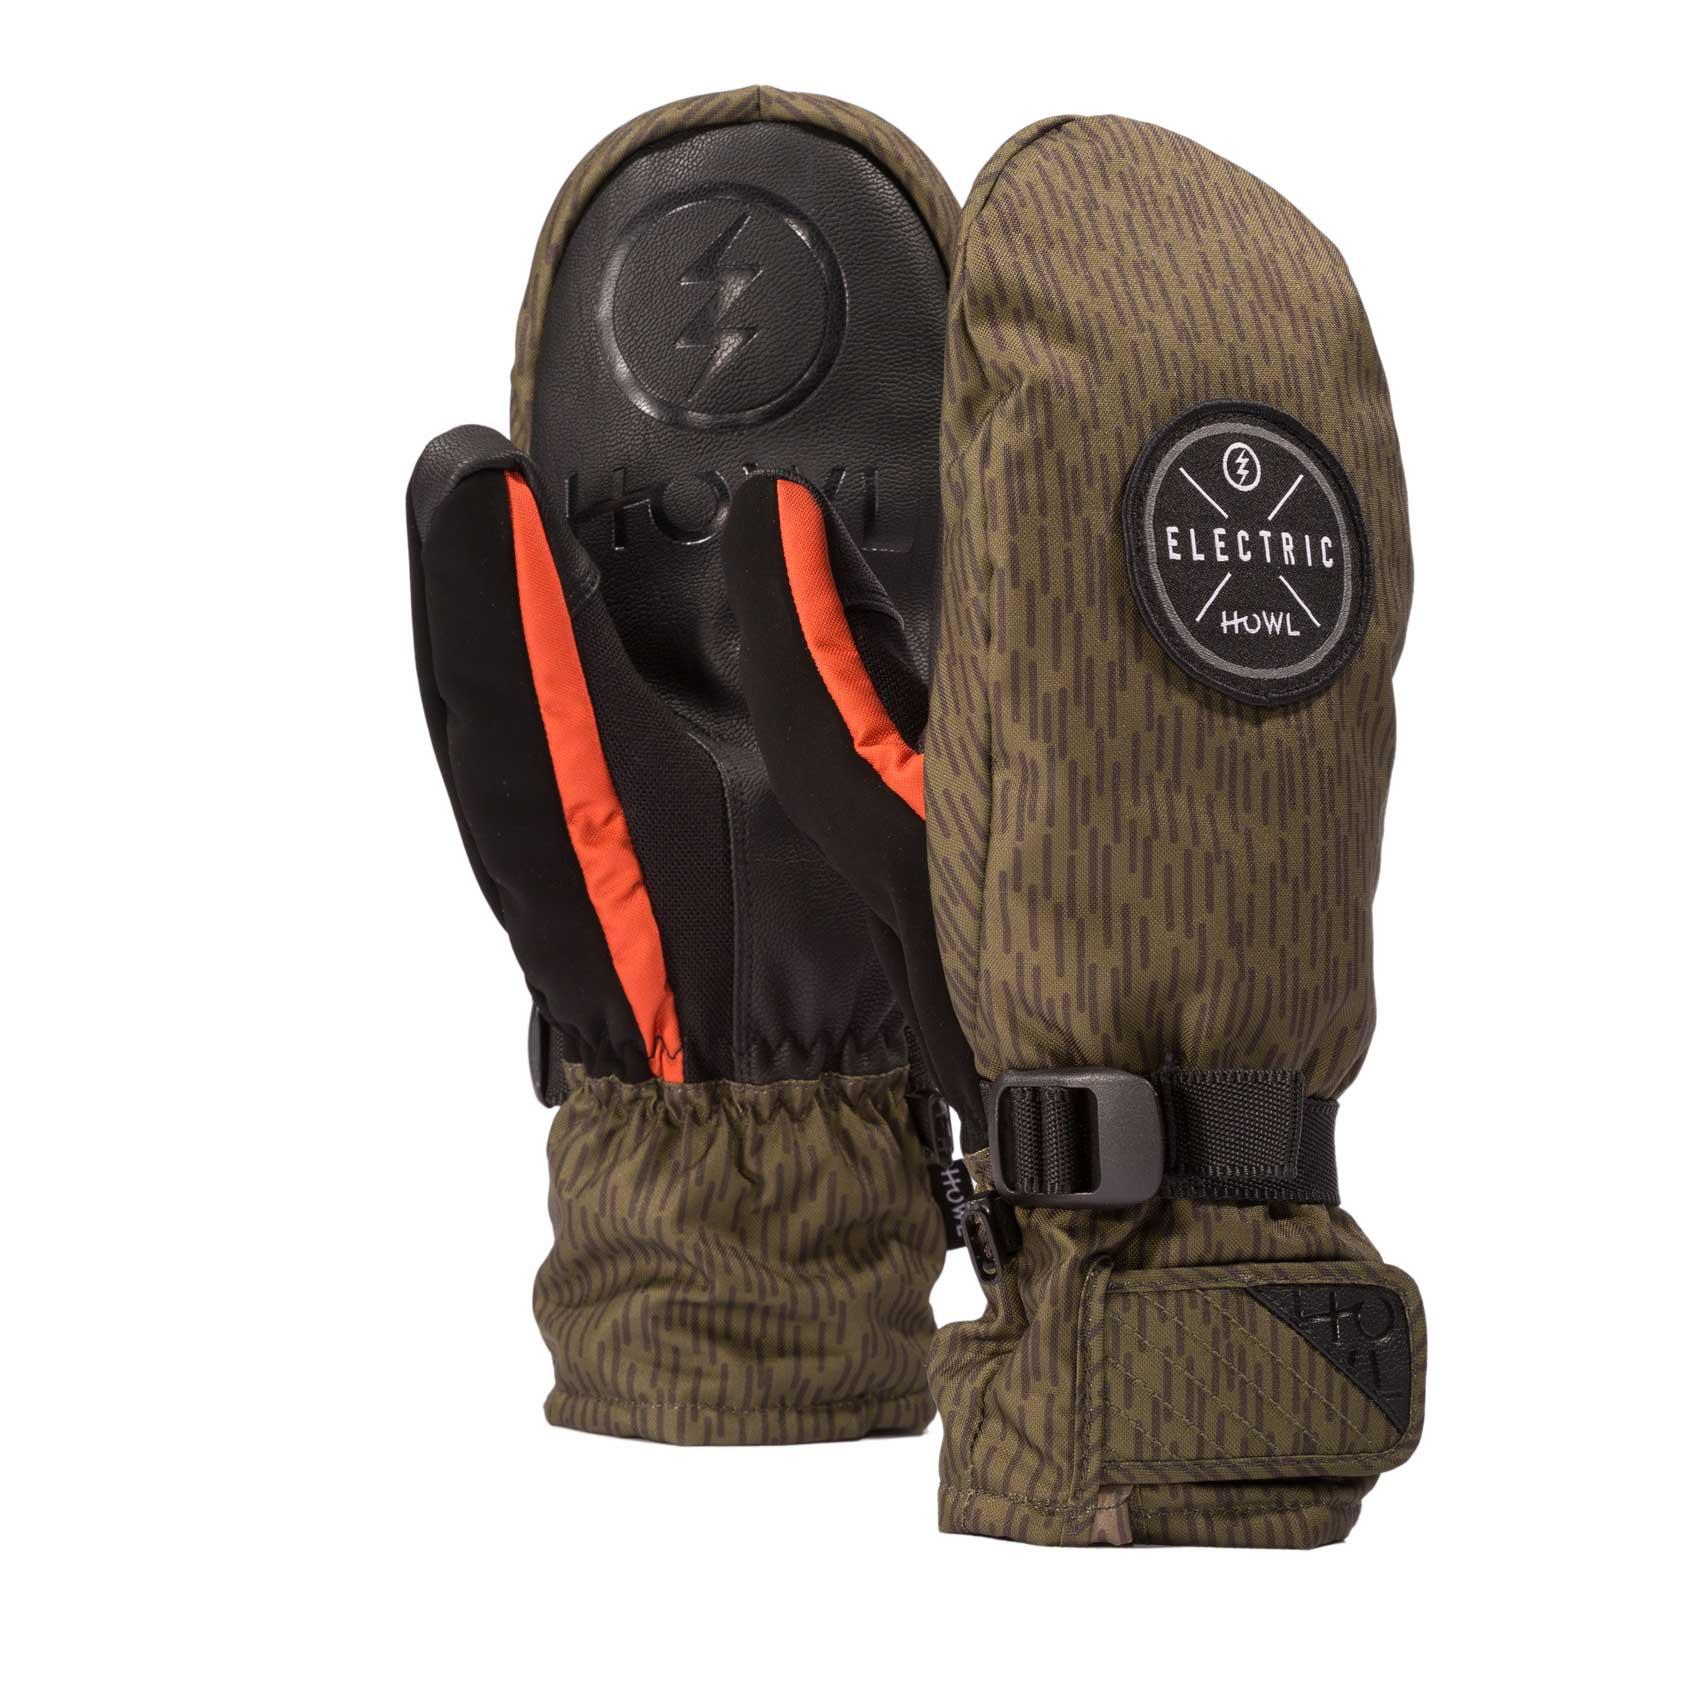 e1522b5615a Howl Snowboard Gloves Fairbanks Electric Mitt 2019